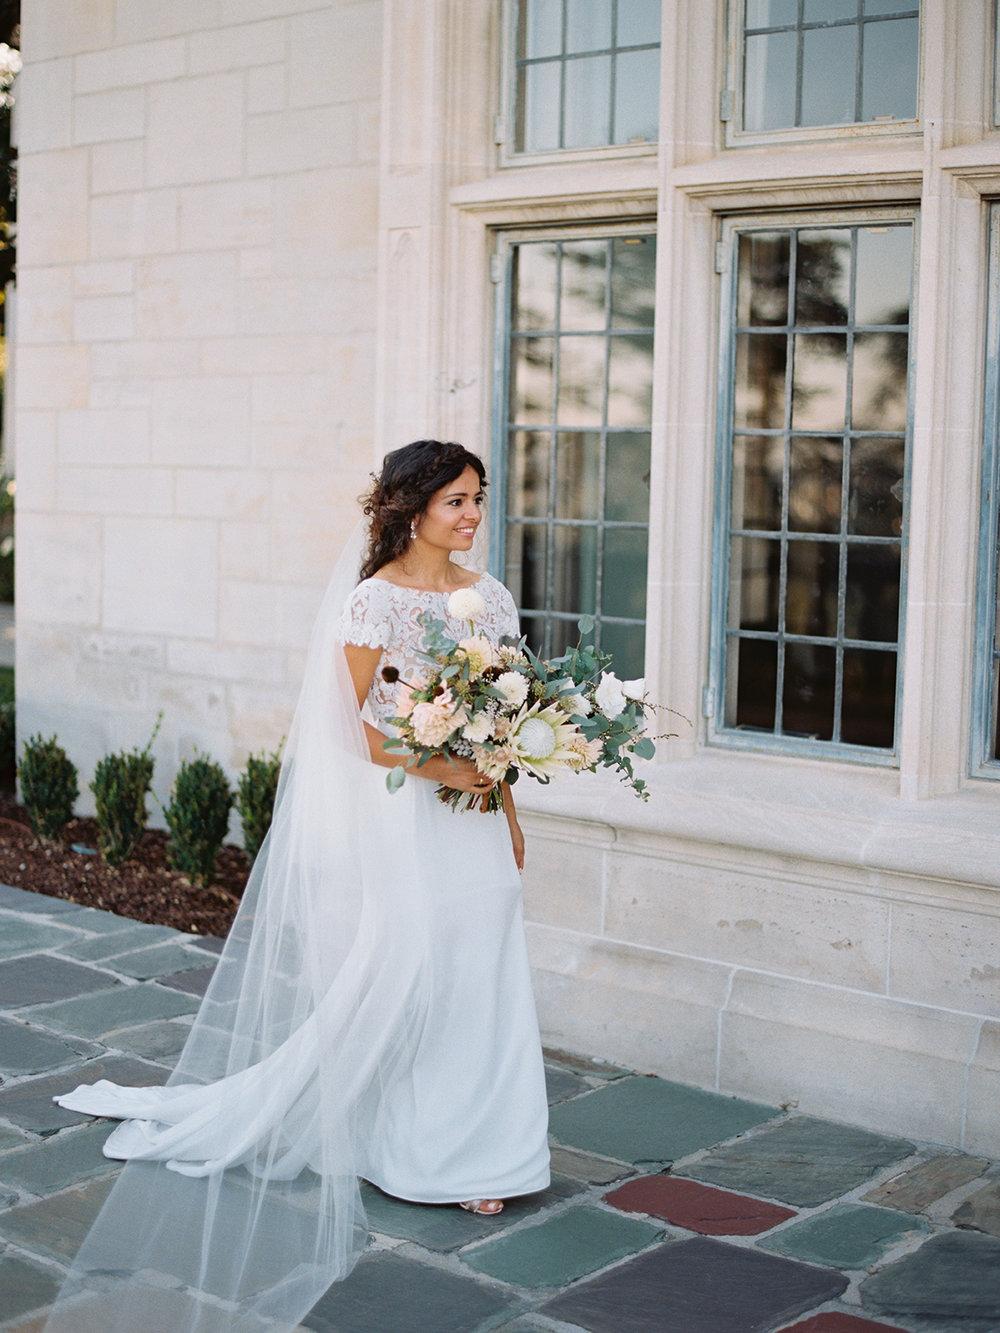 176-brian-sarra-los-angeles-wedding-brumley-wells-photography.jpg